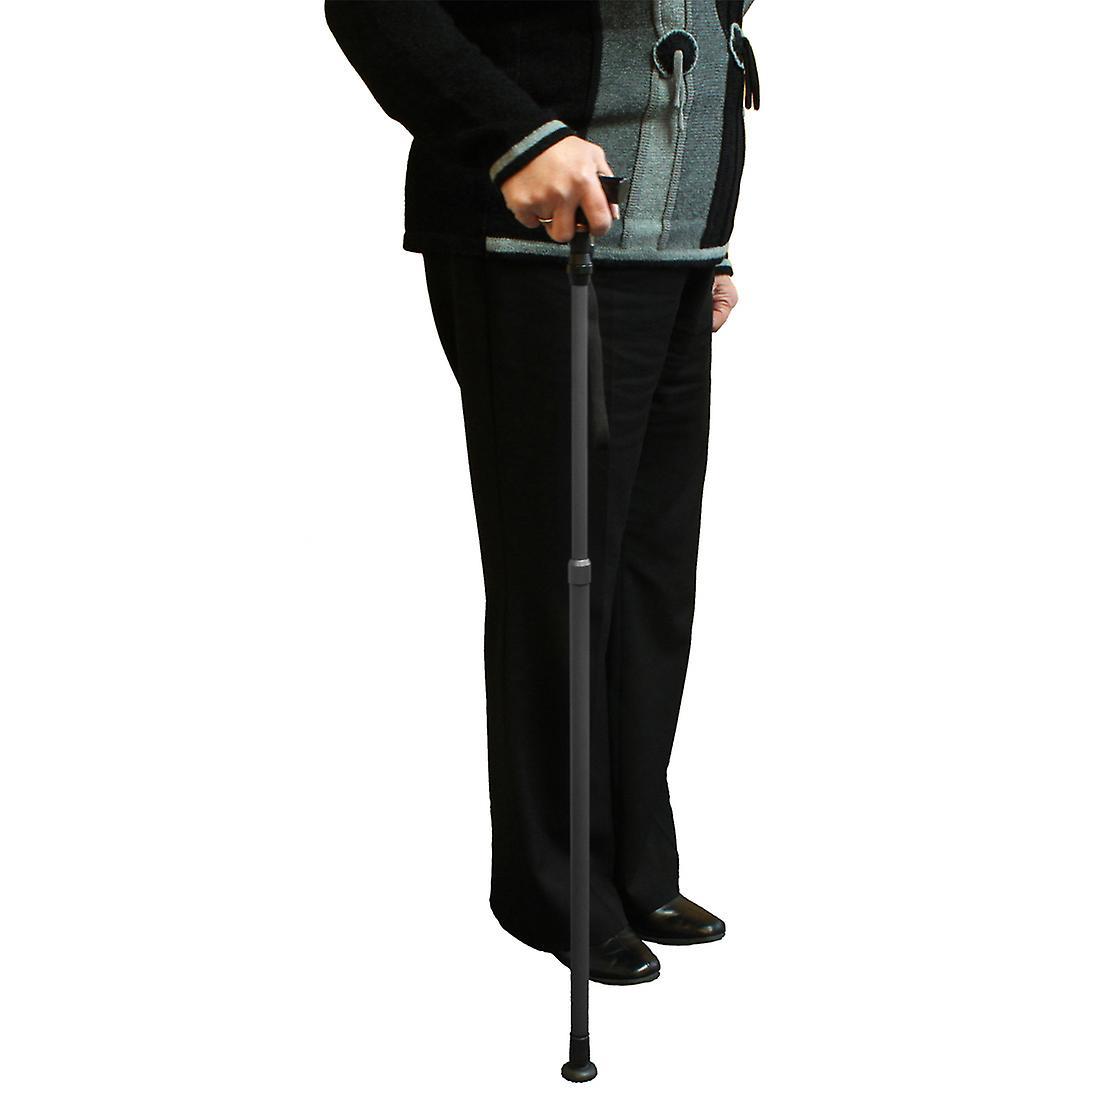 Ultimate, Quick Adjust Walking Stick